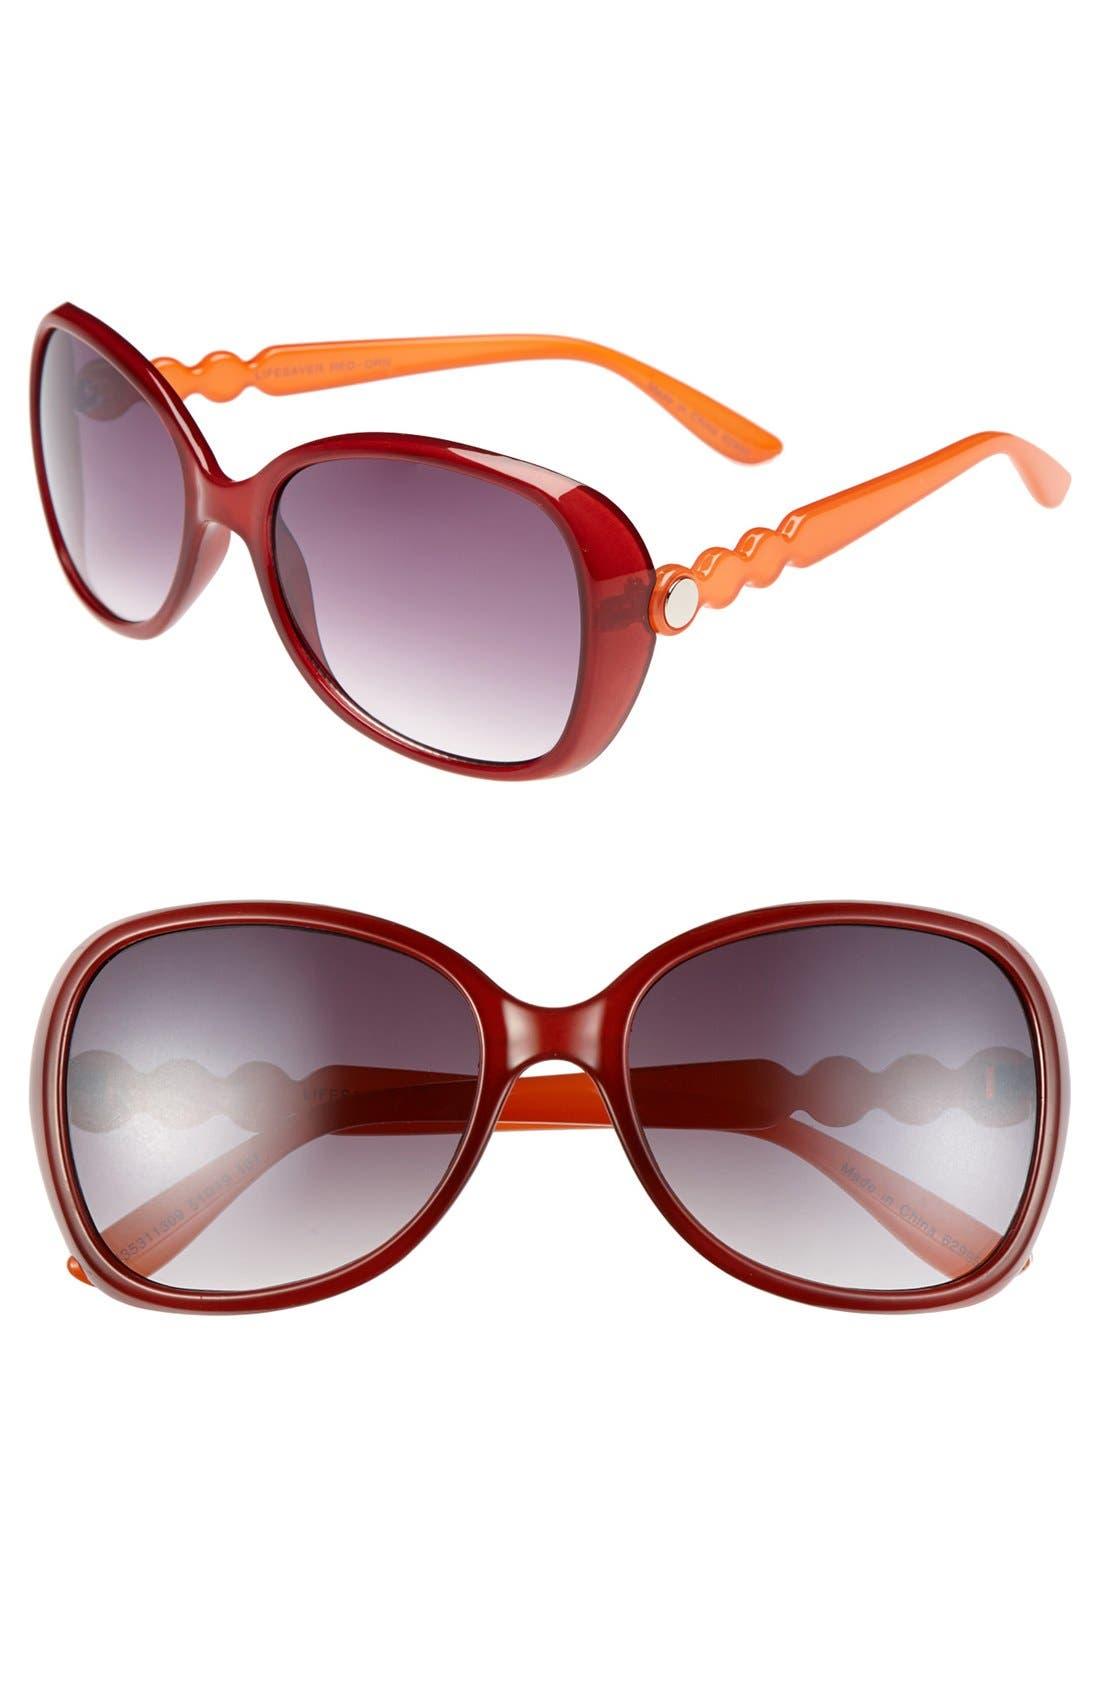 Main Image - Outlook Eyewear 'Lifesaver' 55mm Sunglasses